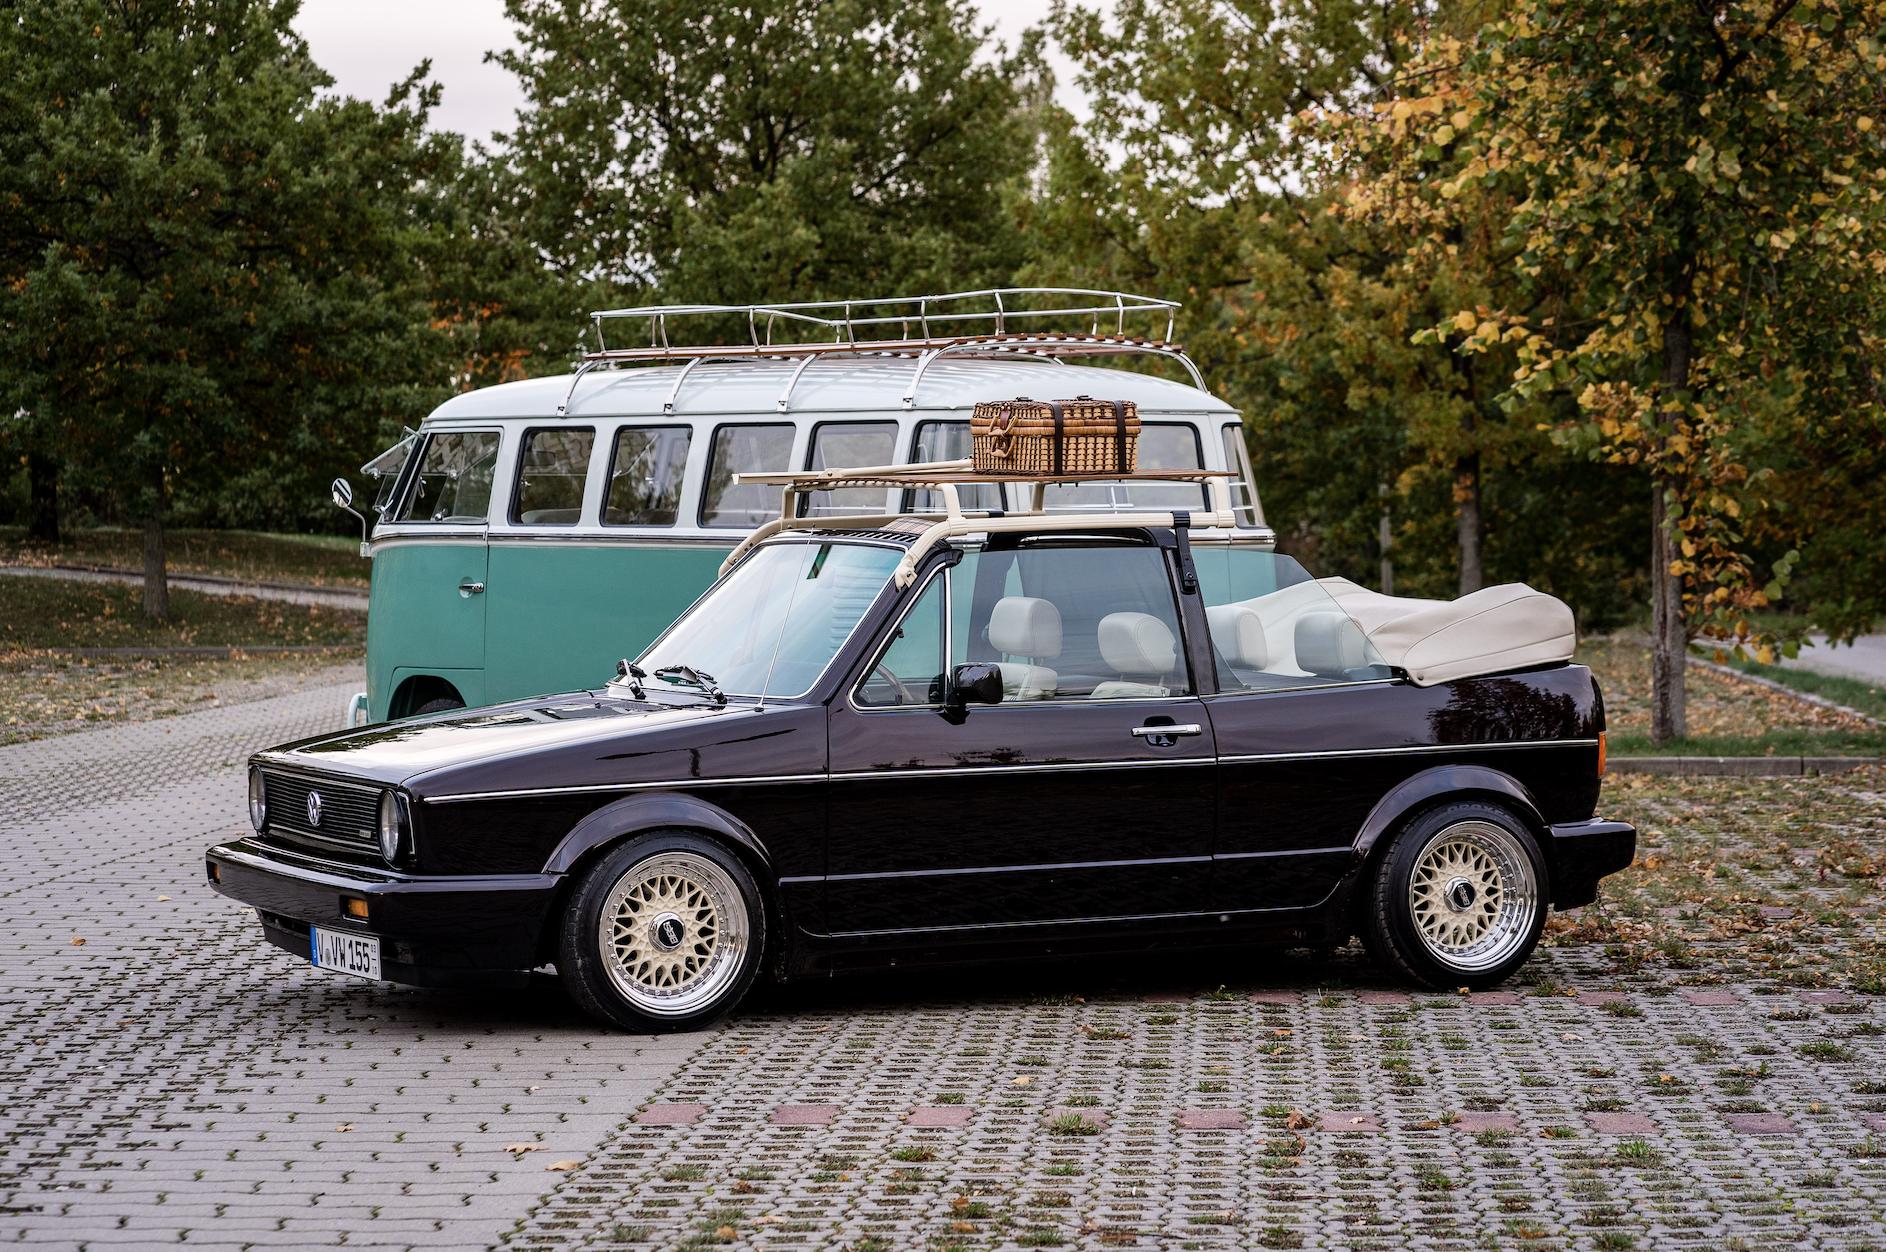 VW T1 Bulli Dachgepäckträger Safarifenster mintgrün Weißwandreifen